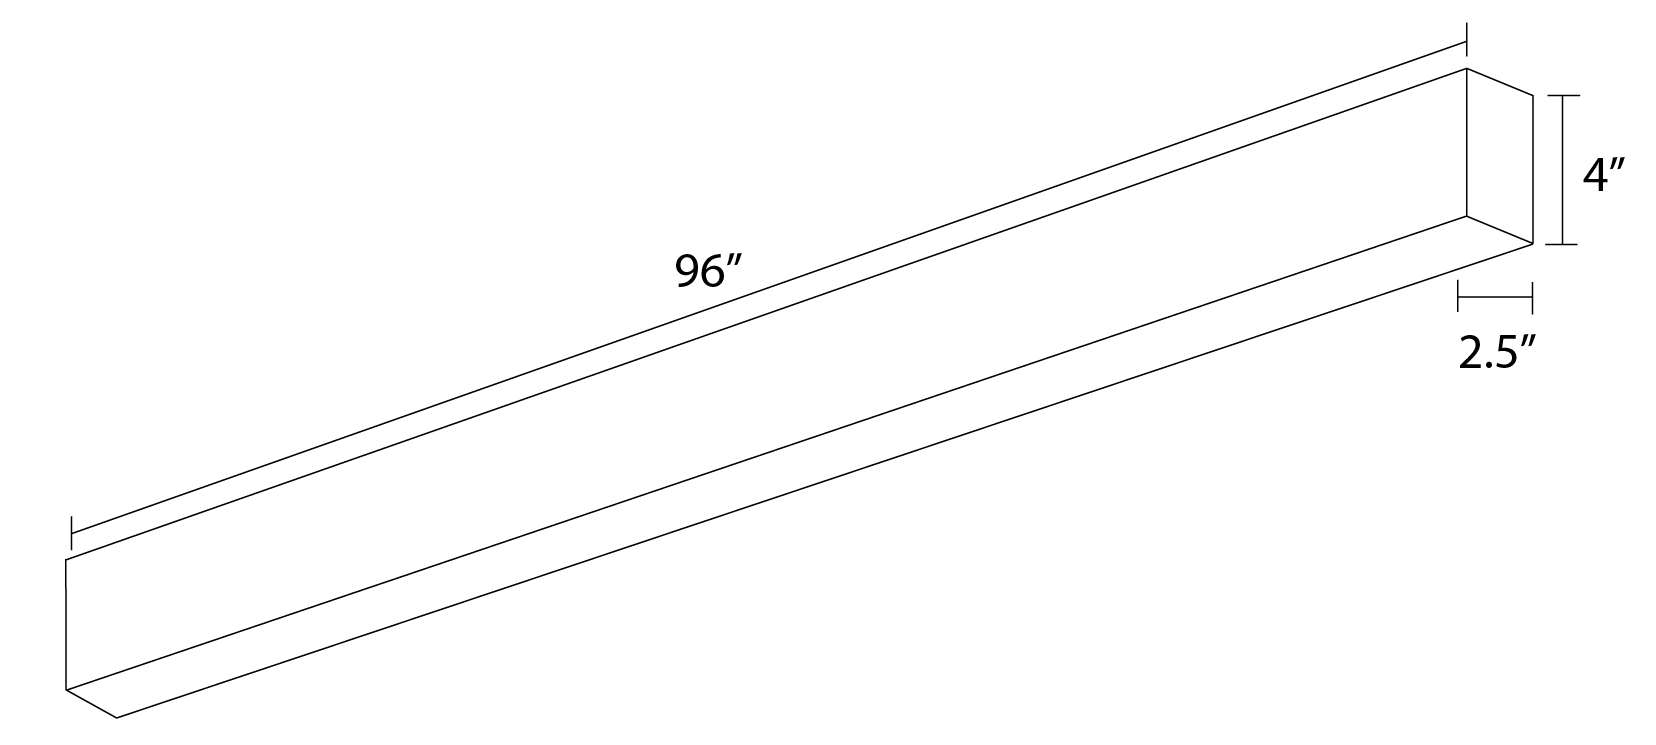 Alcon Lighting 12100-20-S Continuum 20 Series